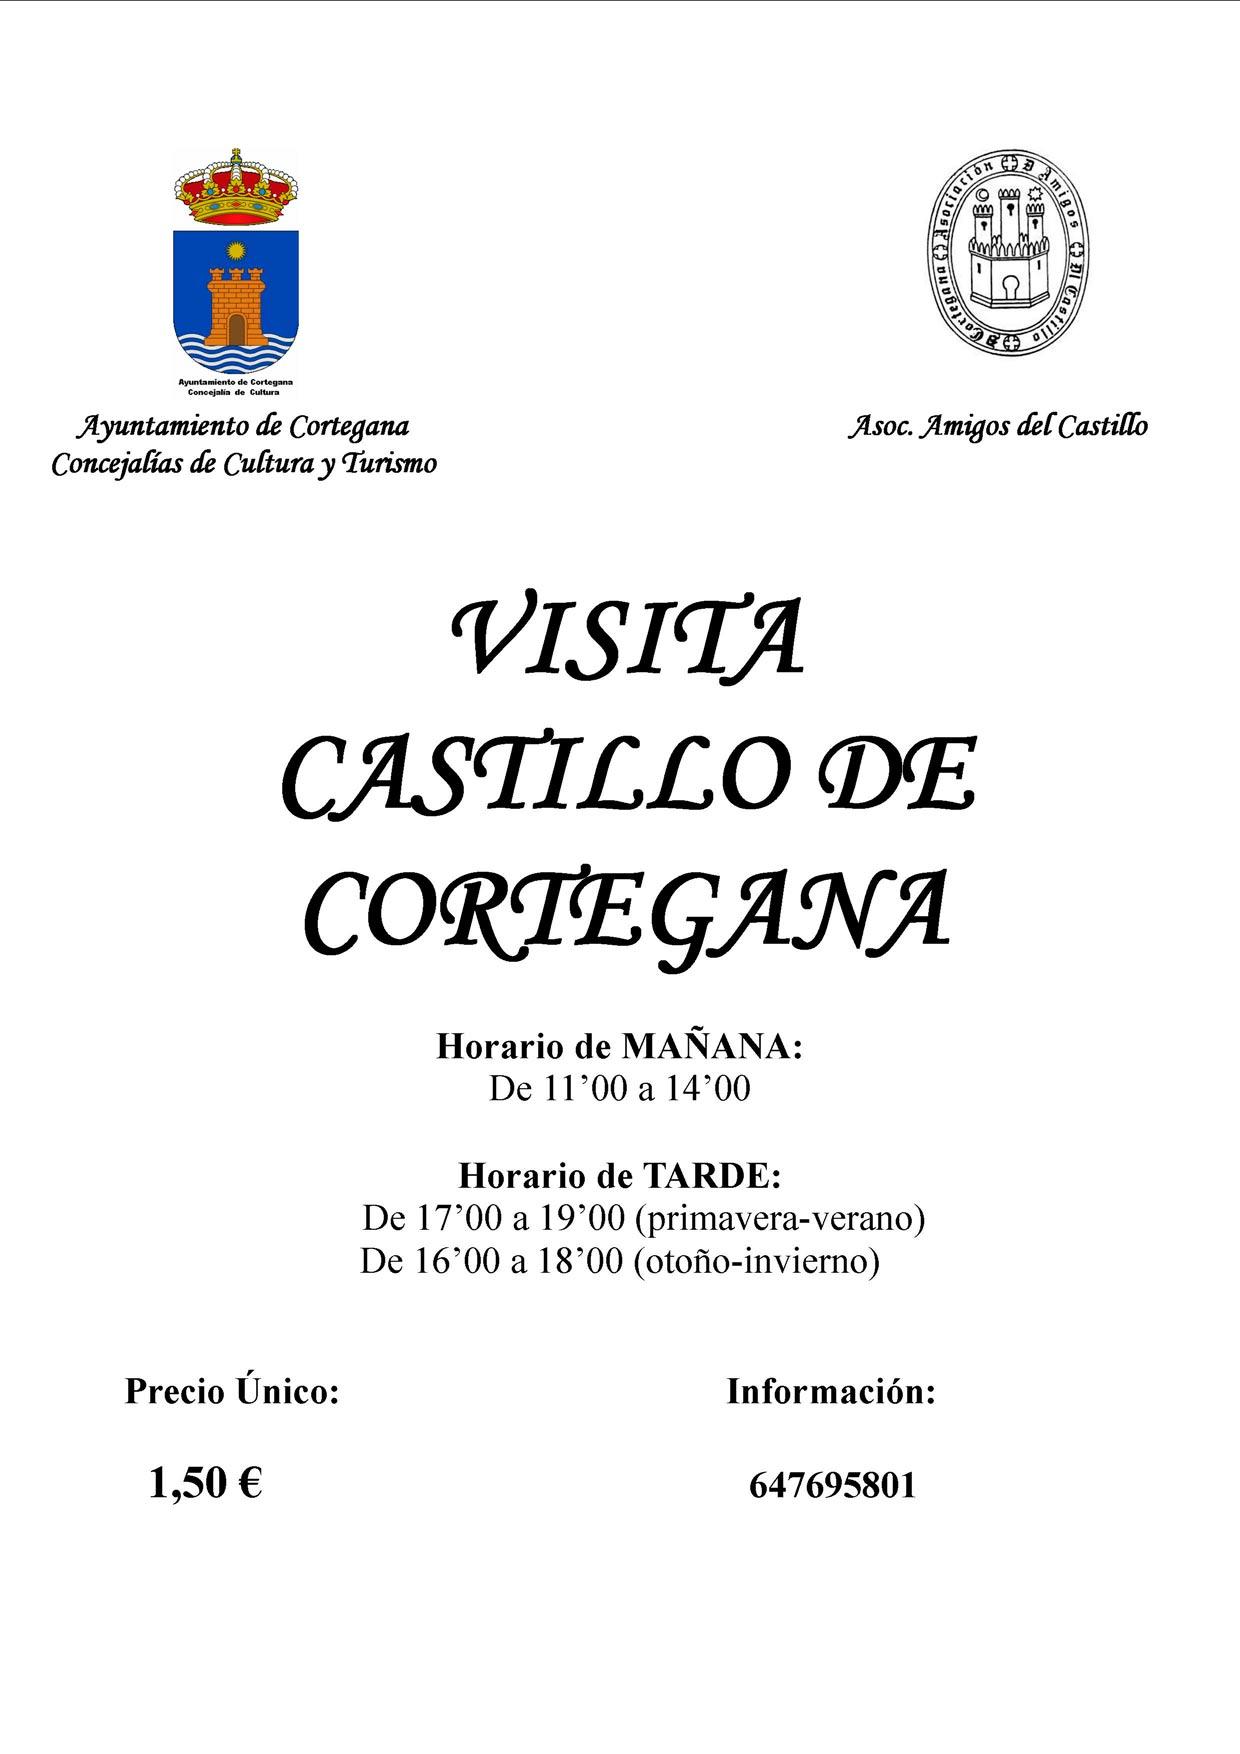 cartel-horario-castillo